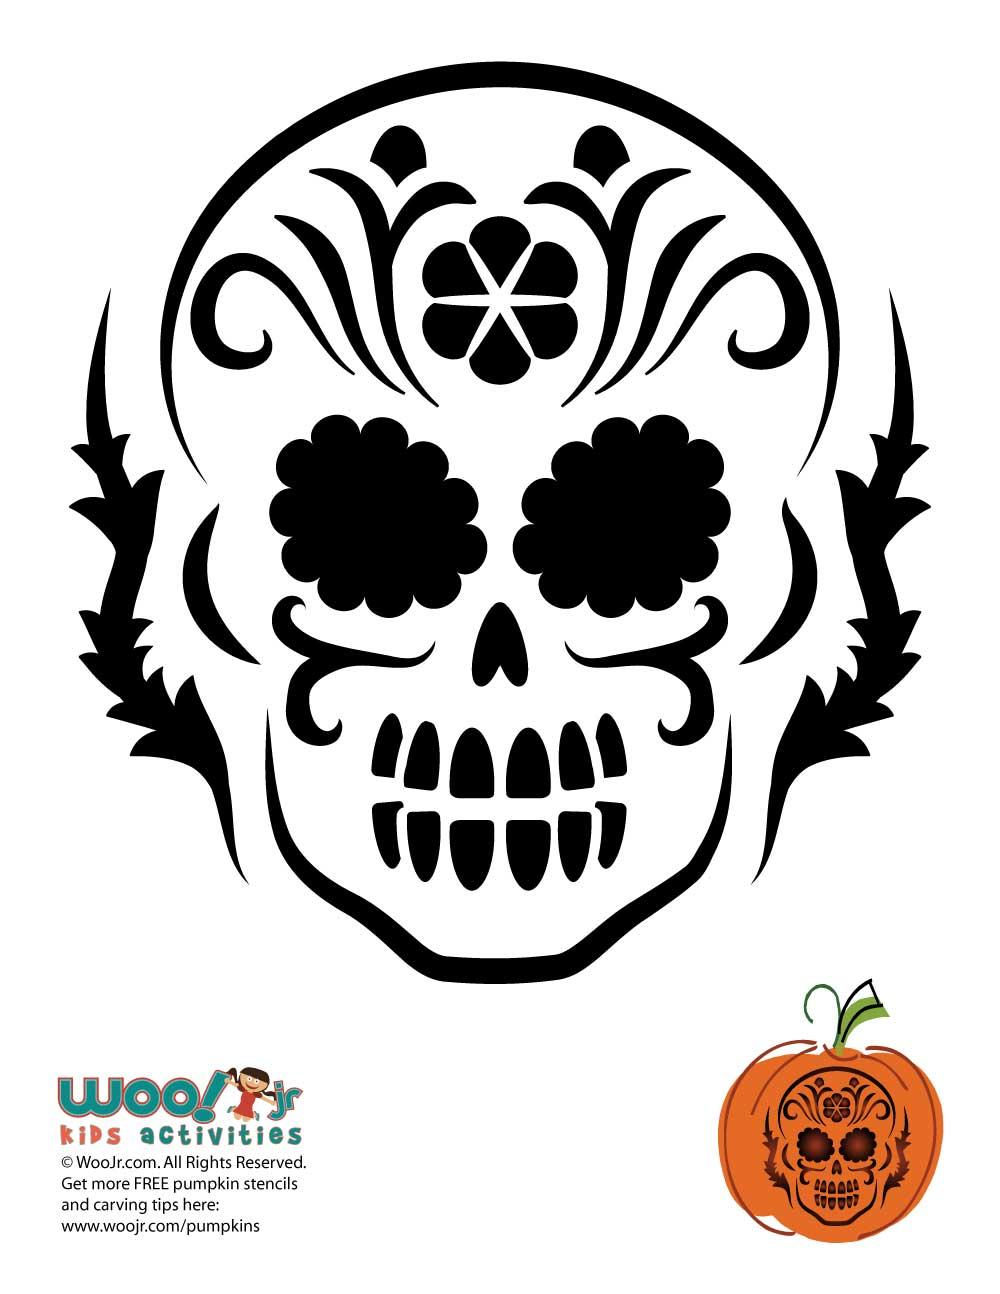 Day Of The Dead Pumpkin Carving Stencils Woo Jr Kids Activities